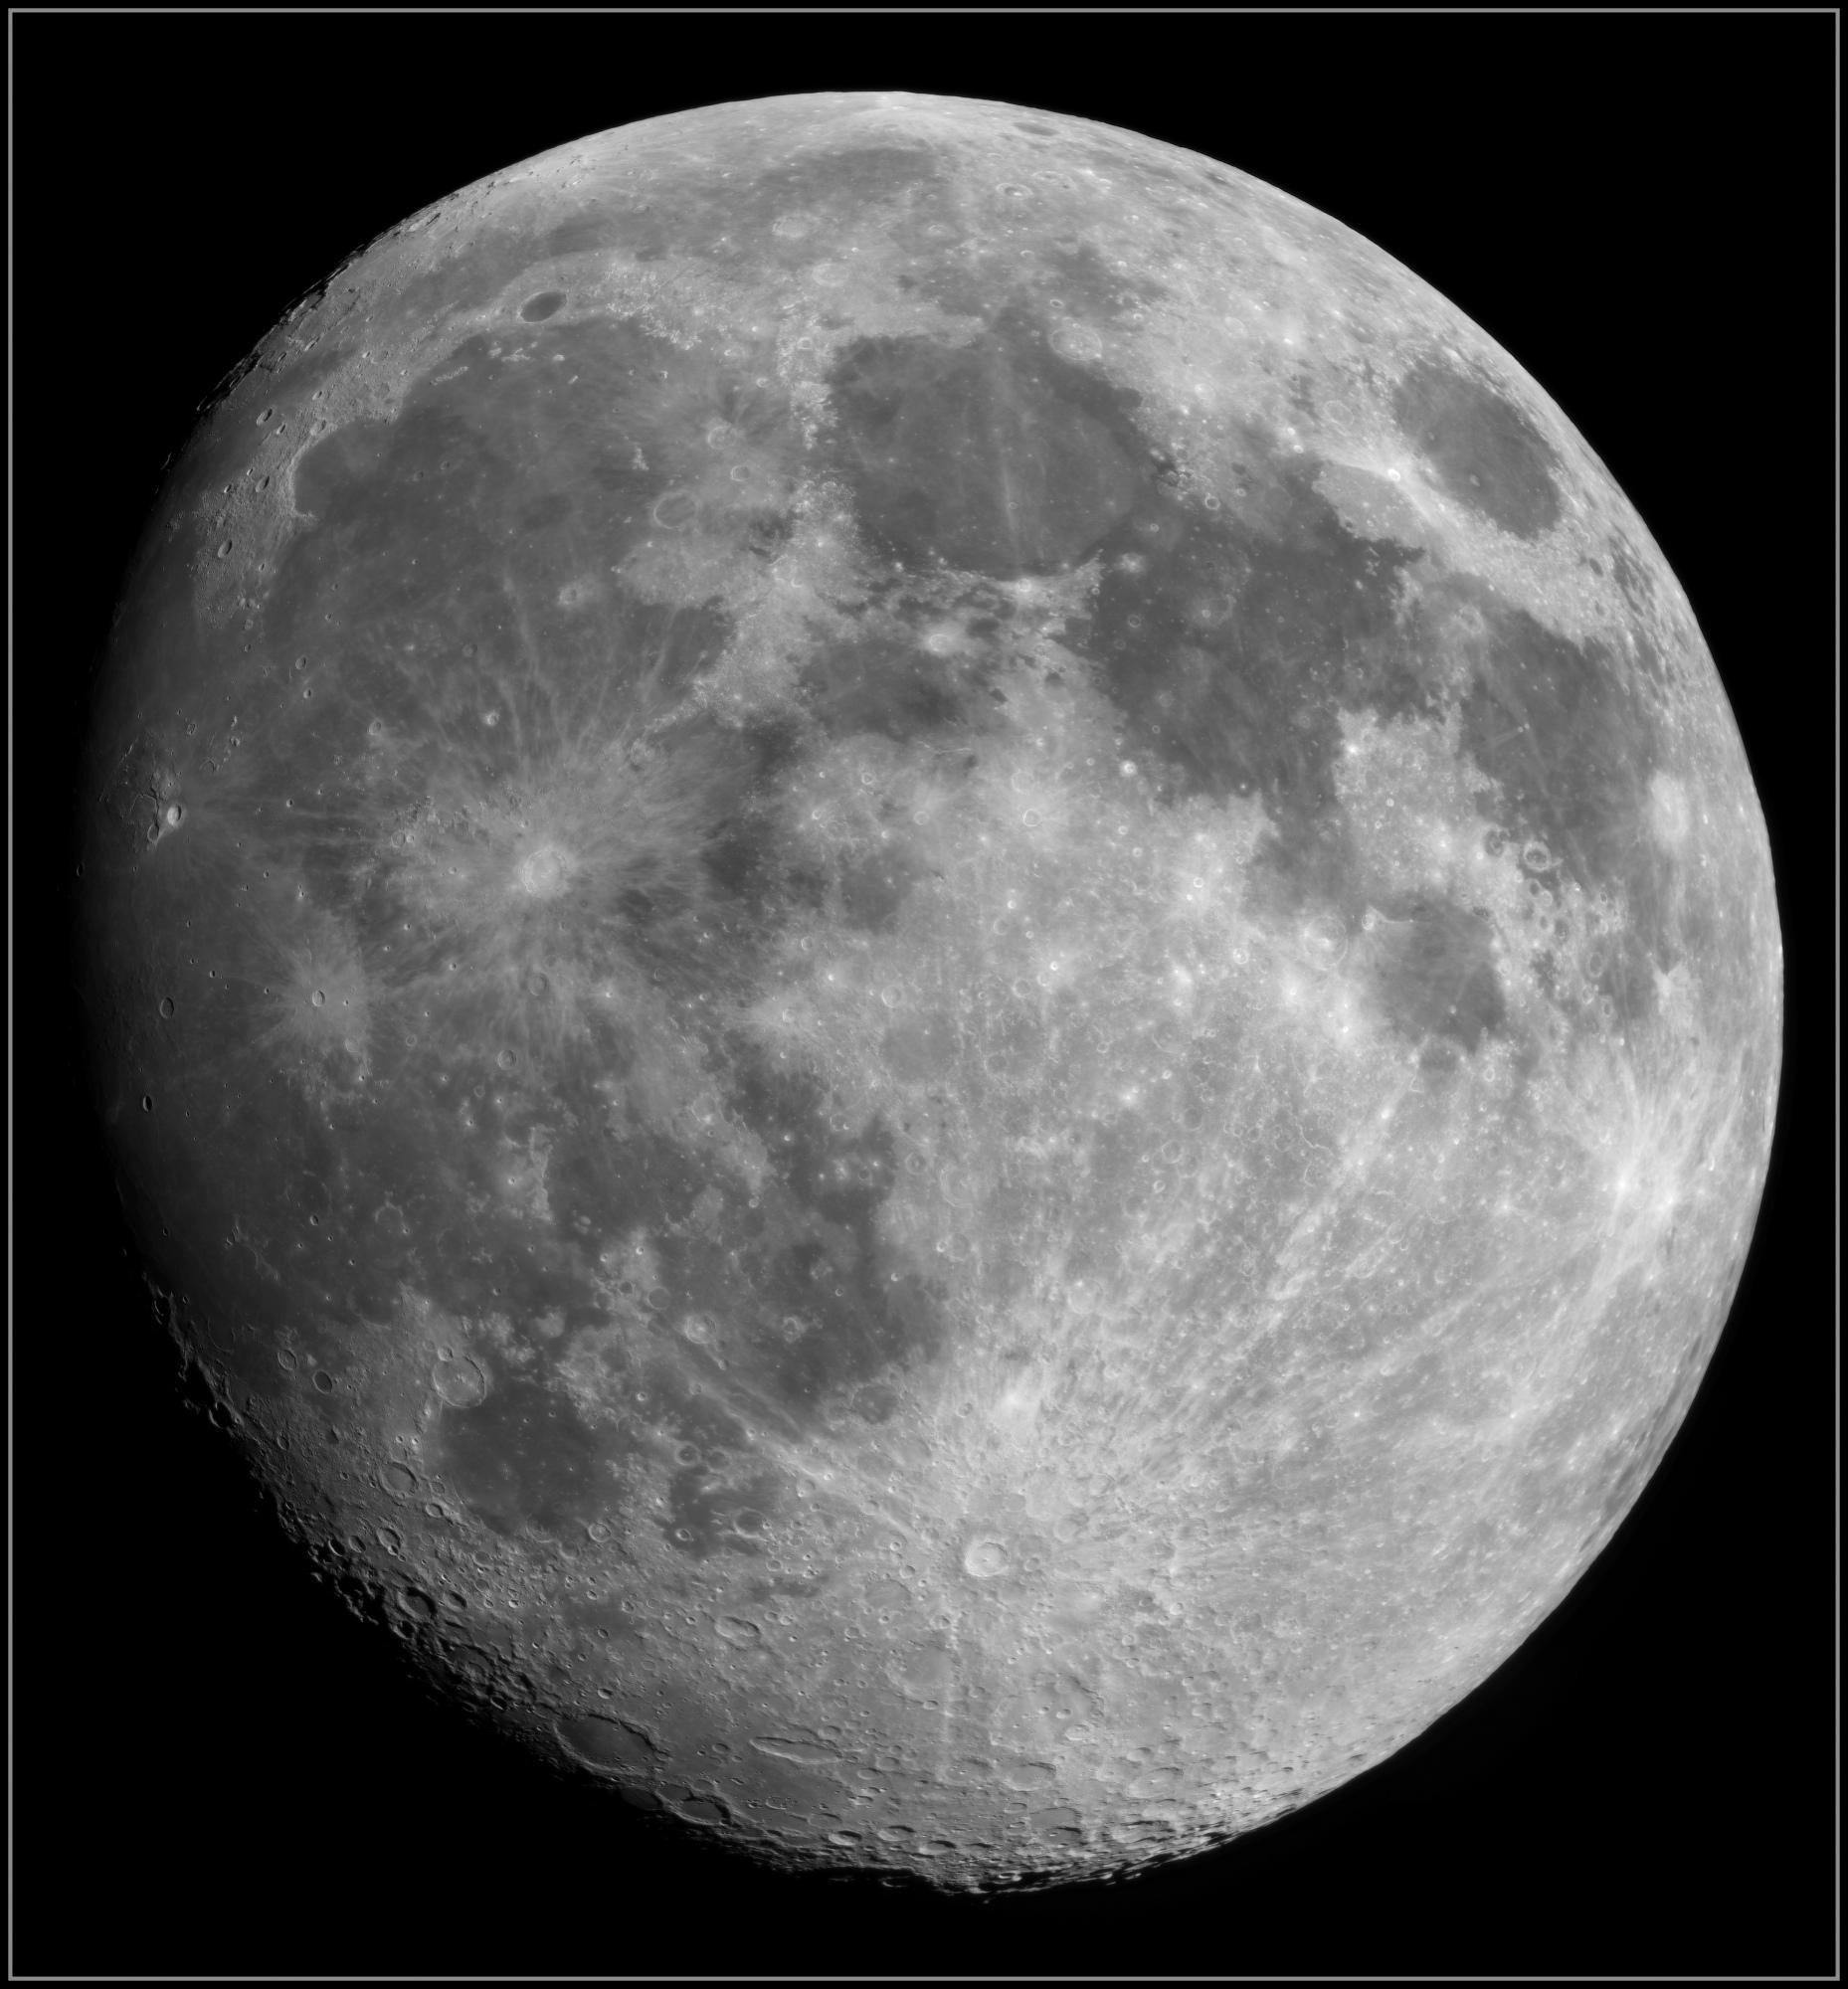 5e8e14e2336ee_Moon_225656_050420_ZWOASI290MM_Rouge_23A_AS_P20_lapl5_ap634_AI_Deconvolution_1-_stitch.thumb.jpg.8e2423426911ae9c30cd473c745d3662.jpg